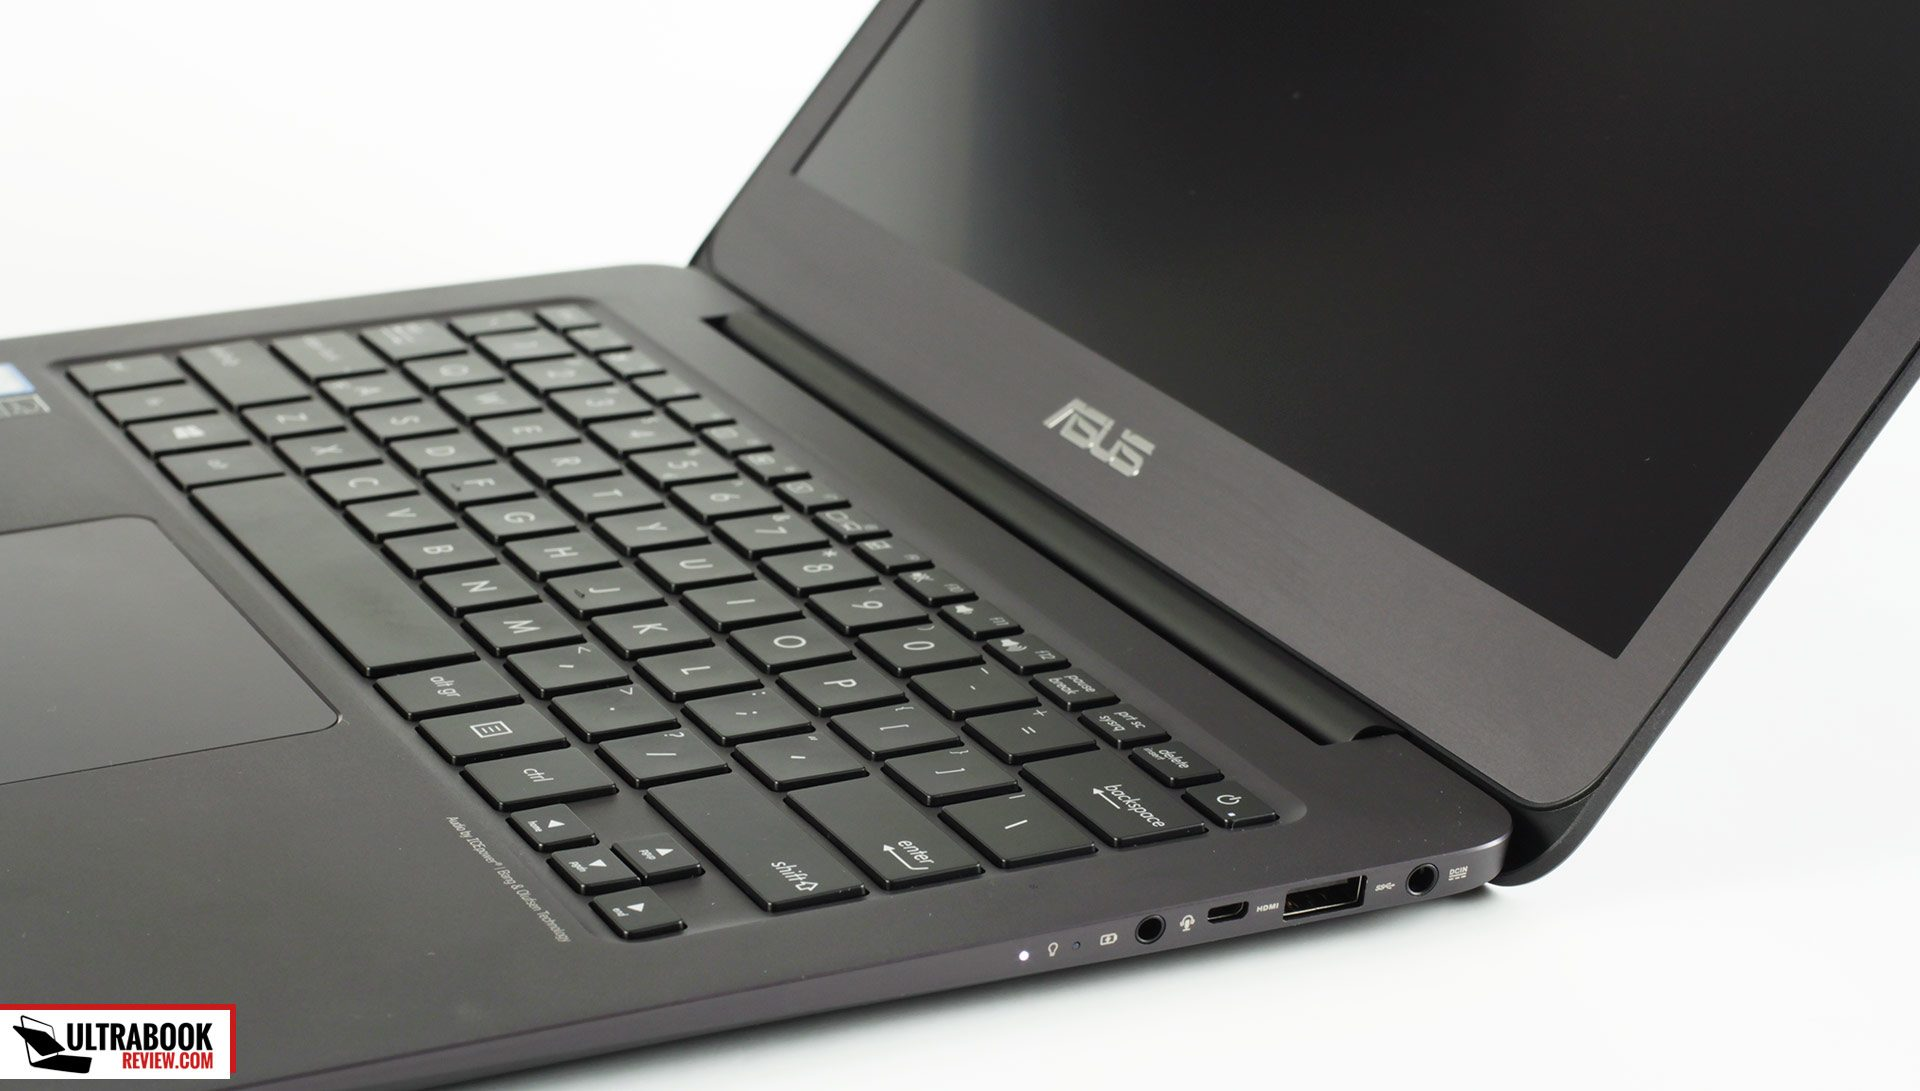 ASUS ZenBook UX305UA ICE Sound Windows 8 X64 Treiber